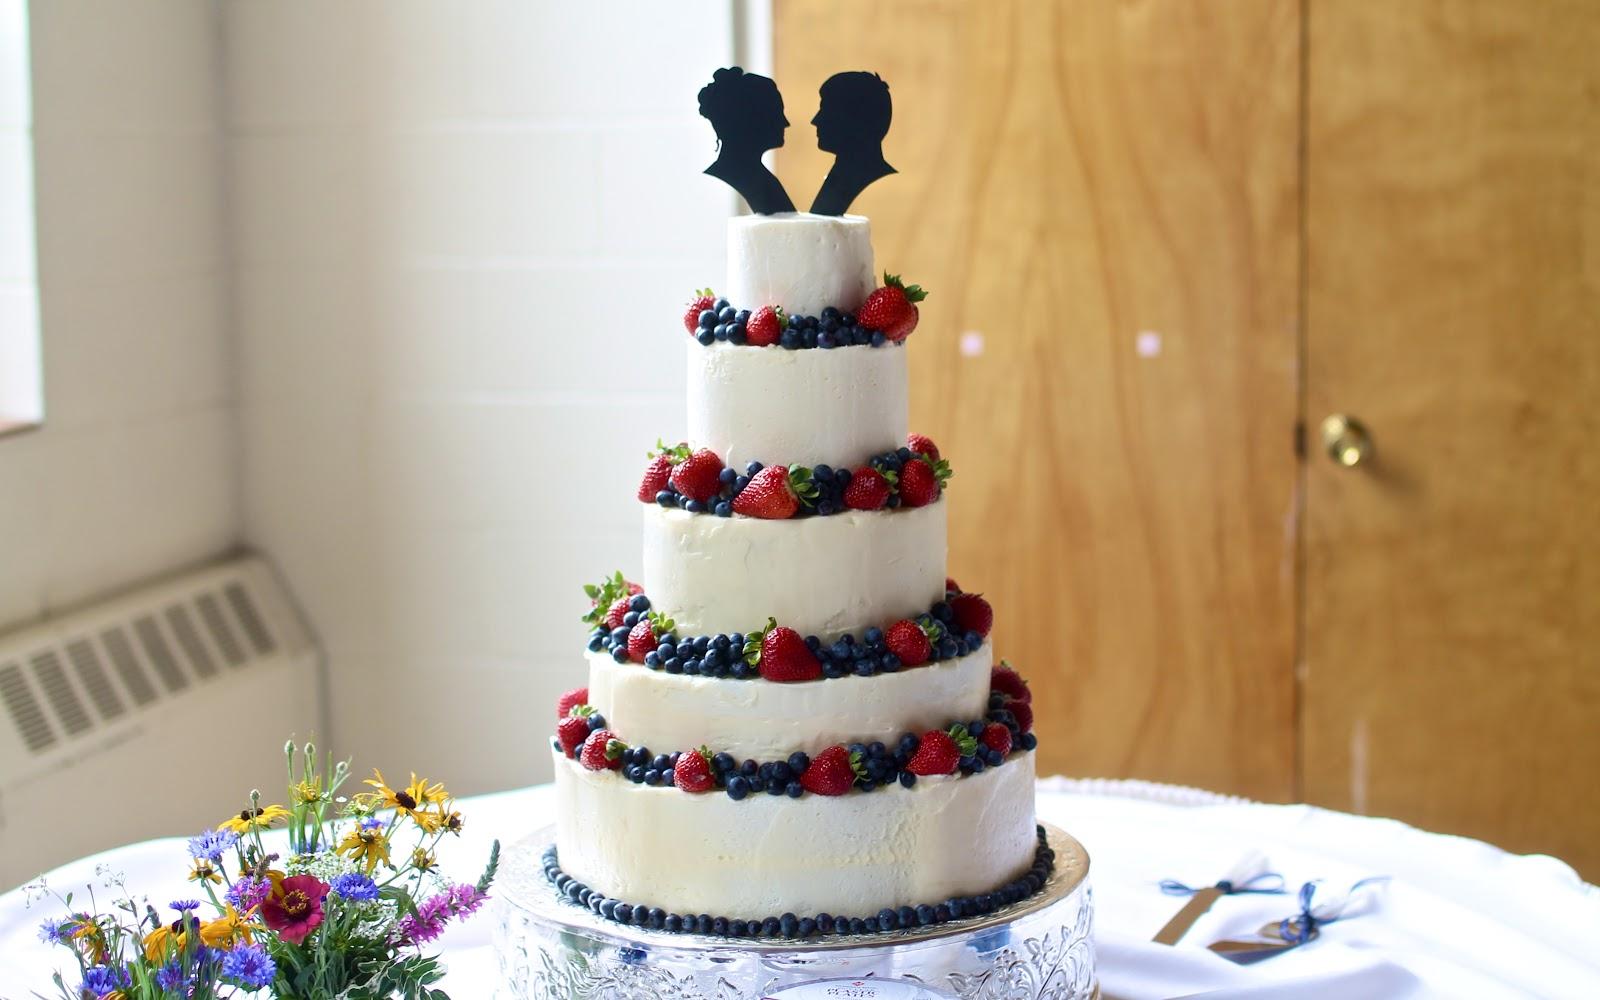 Tarts wedding cakes